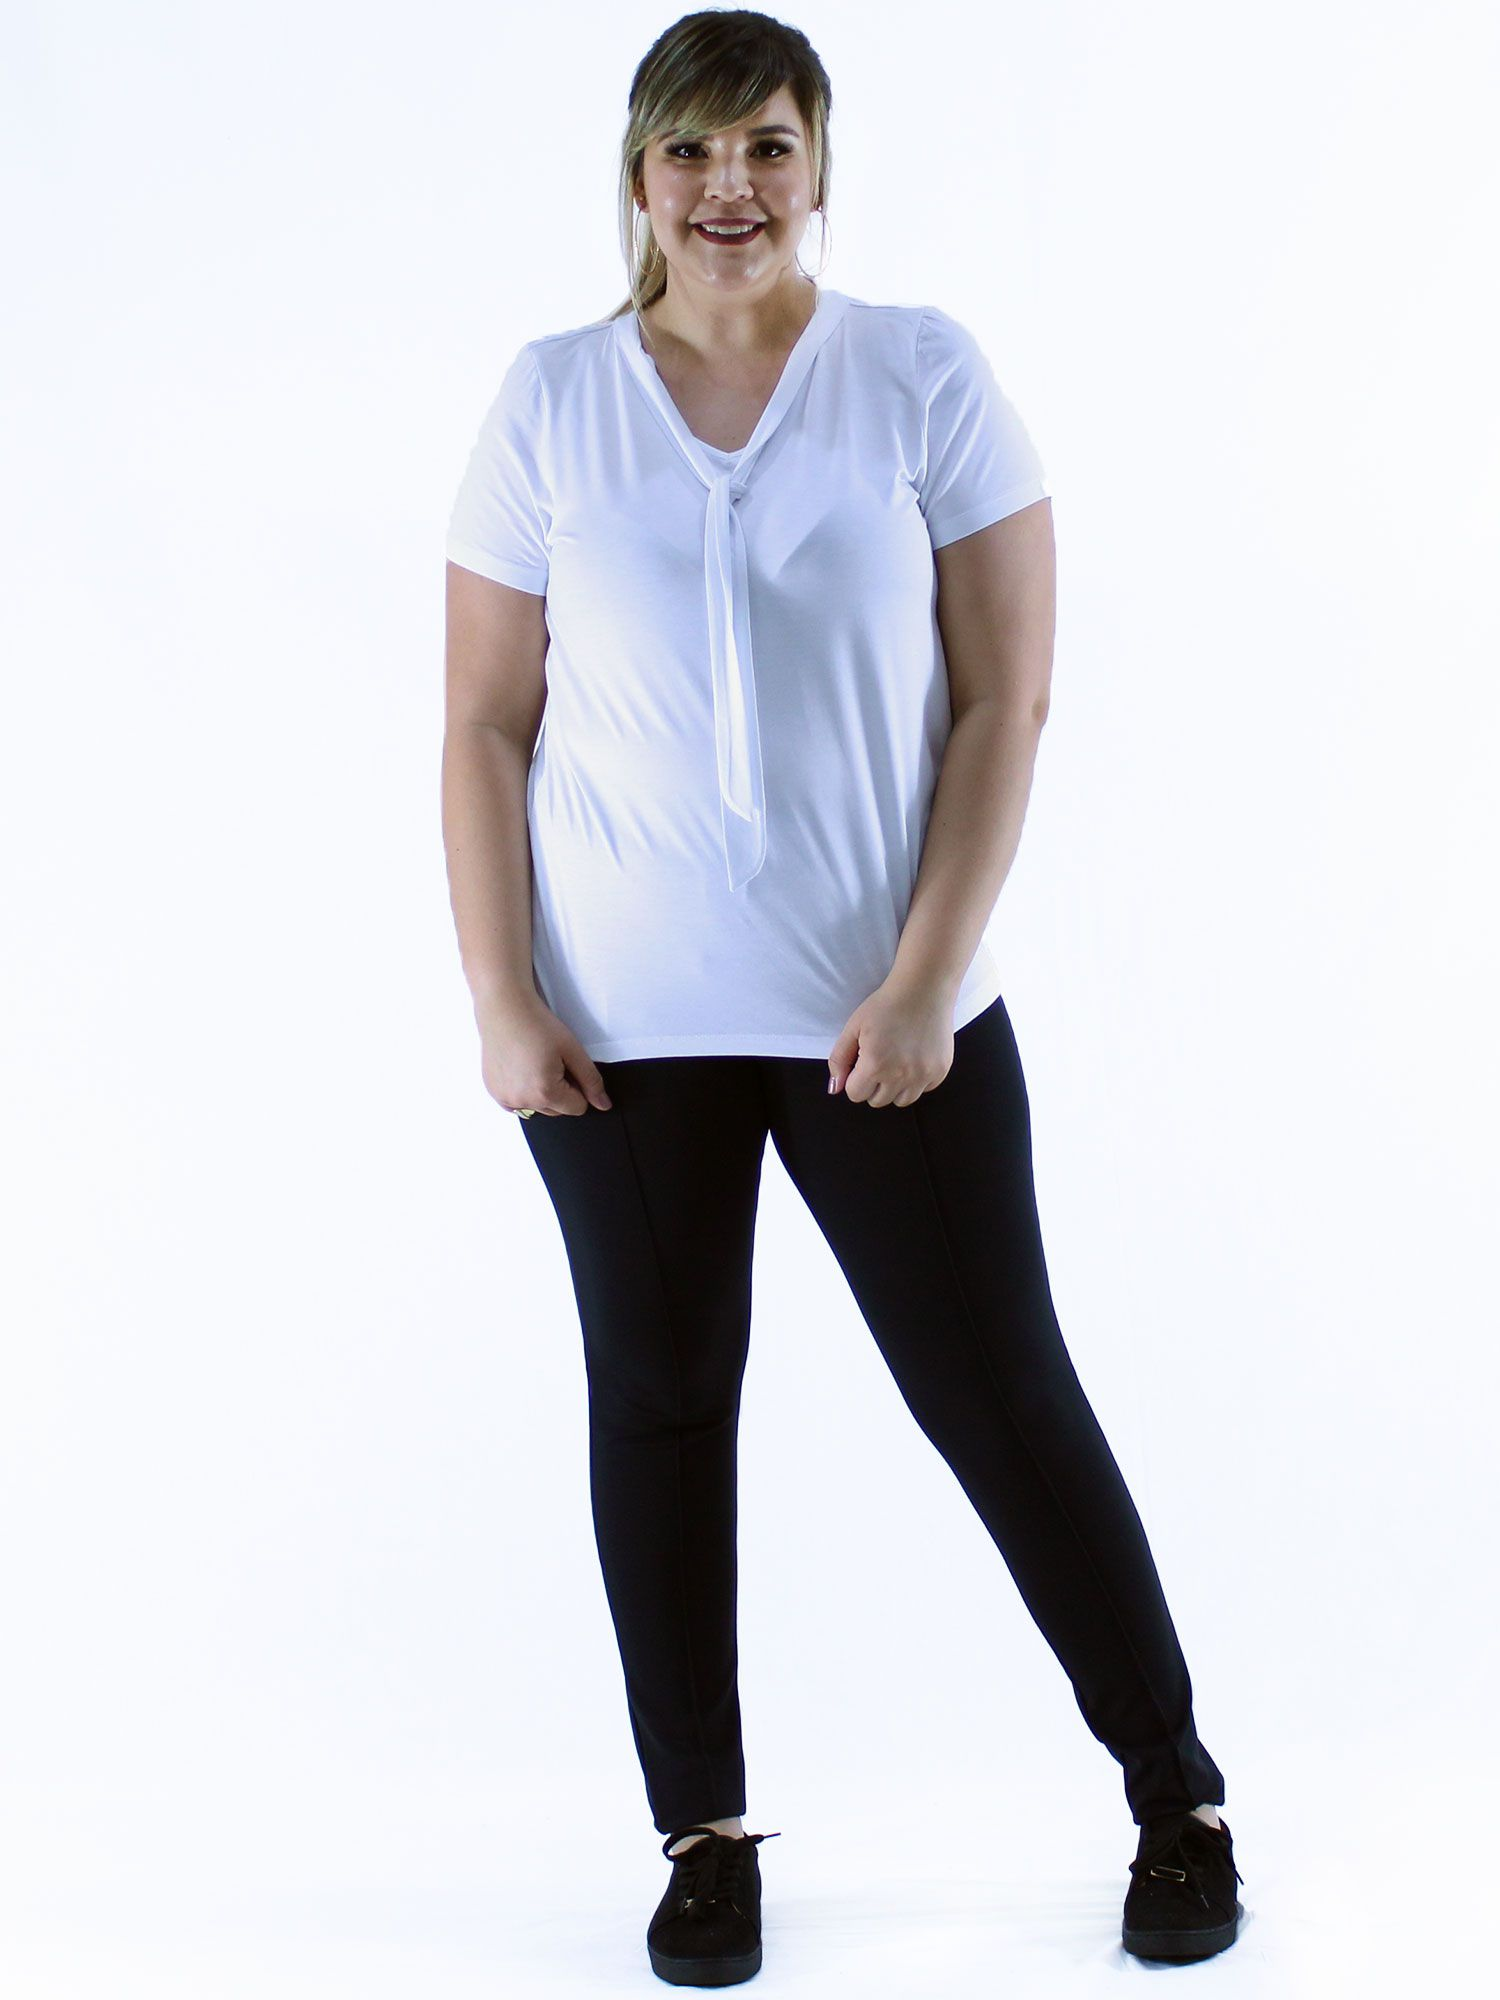 Blusa Plus Size Feminino Manga Curta Decote Laço Branco